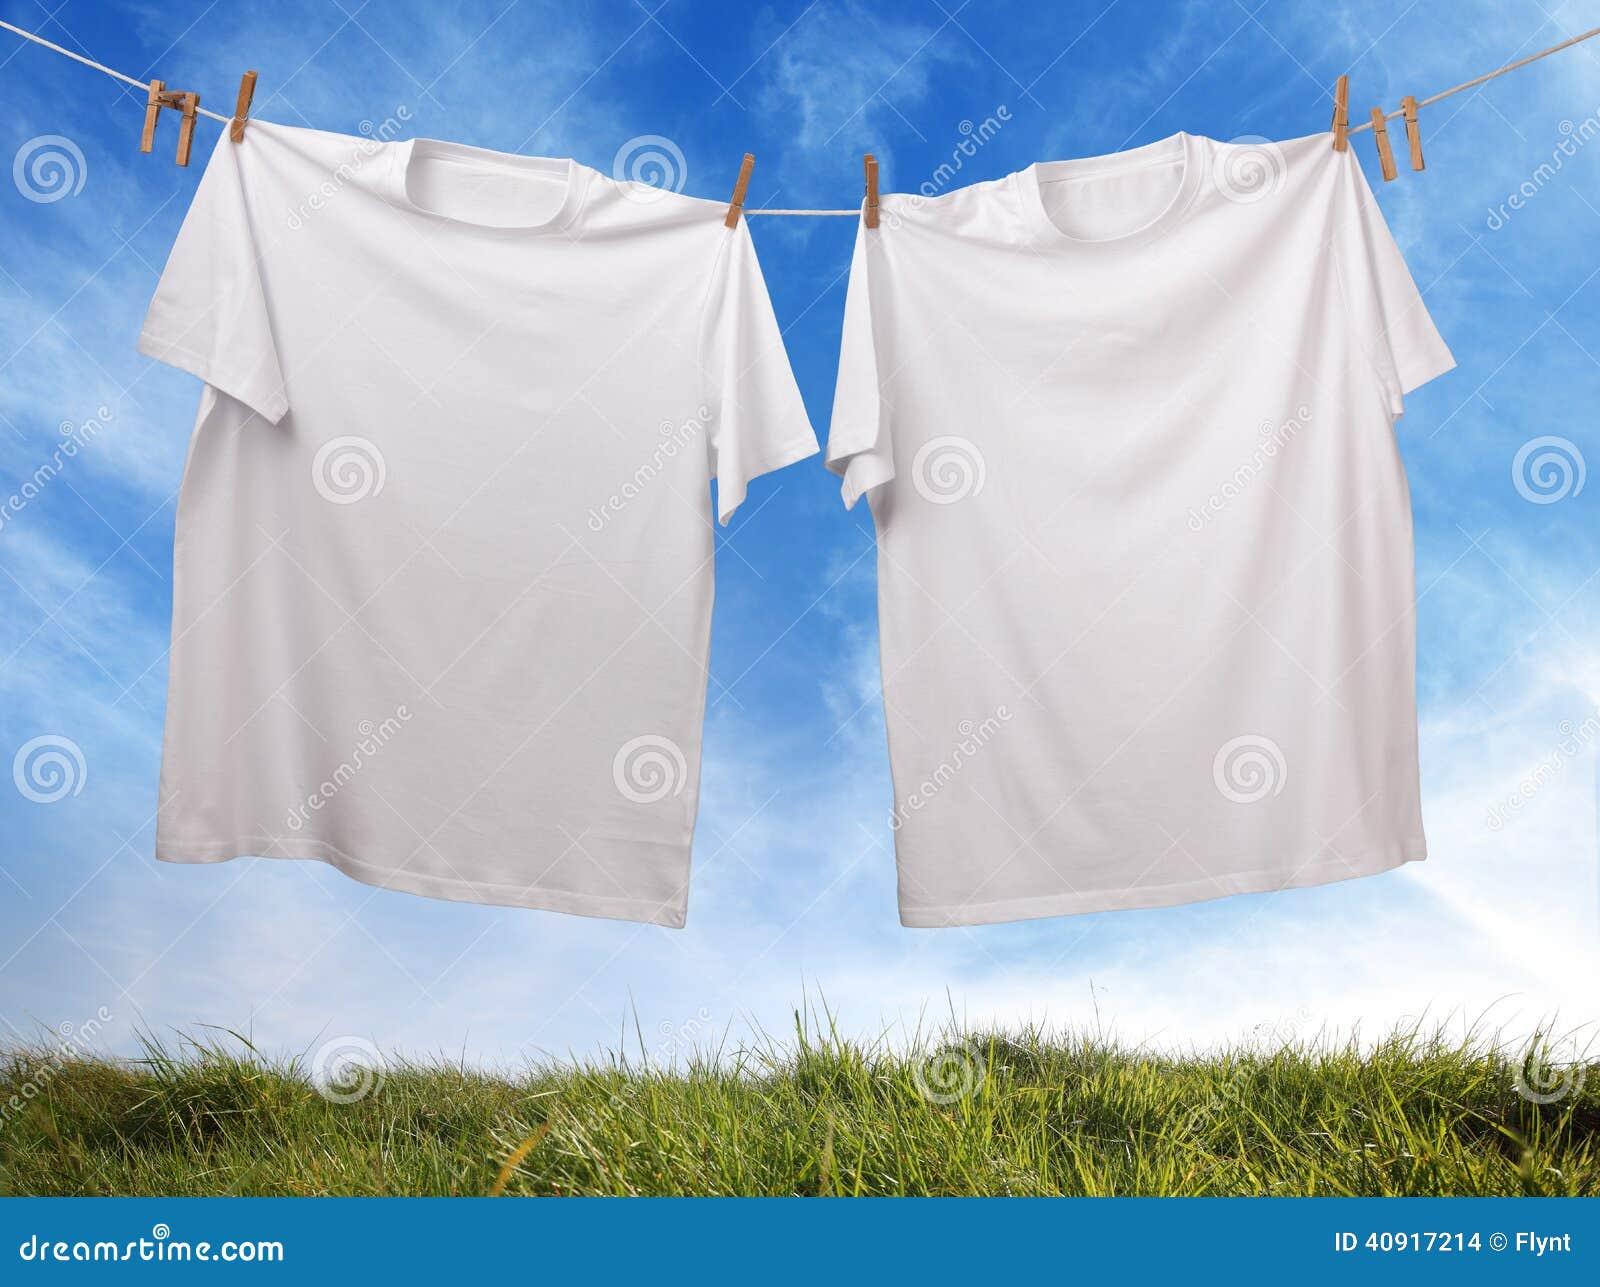 t shirt blanc vide accrochant sur la corde linge photo stock image 40917214. Black Bedroom Furniture Sets. Home Design Ideas